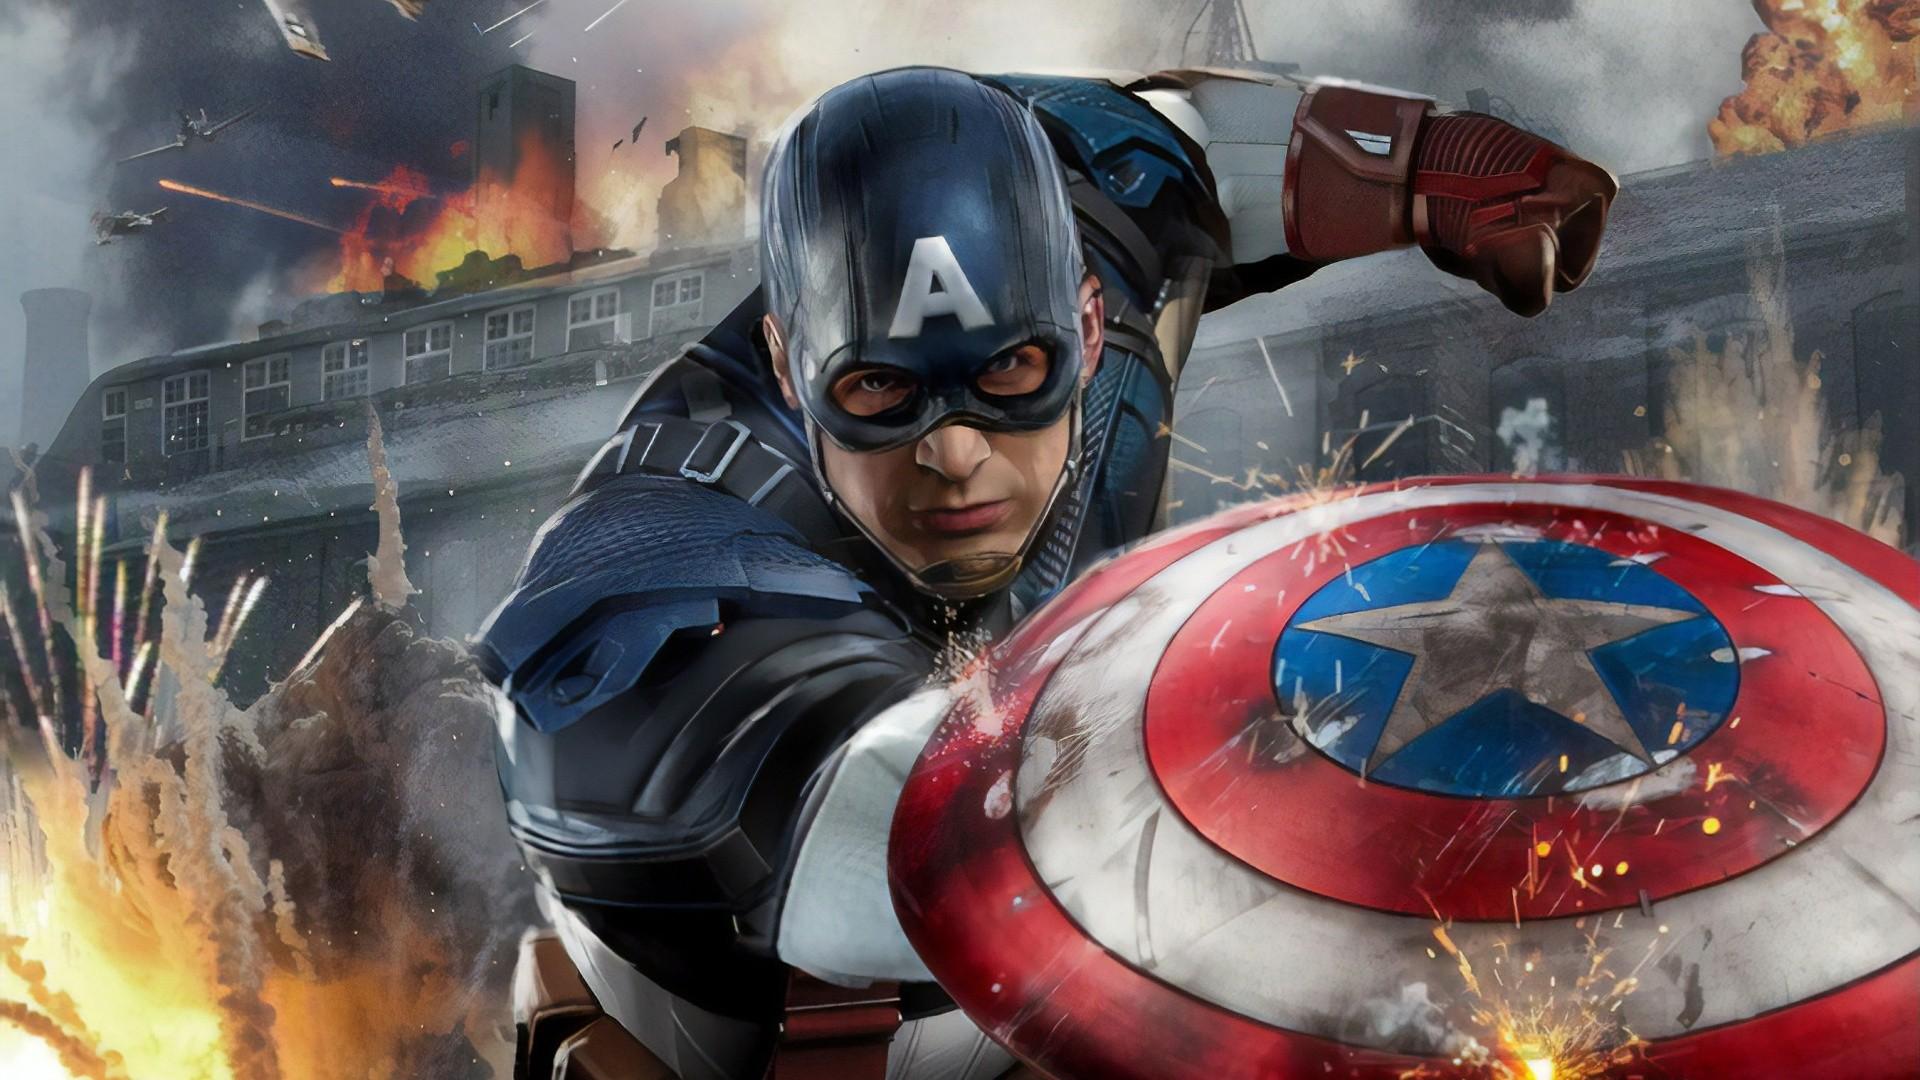 Captain America download wallpaper image